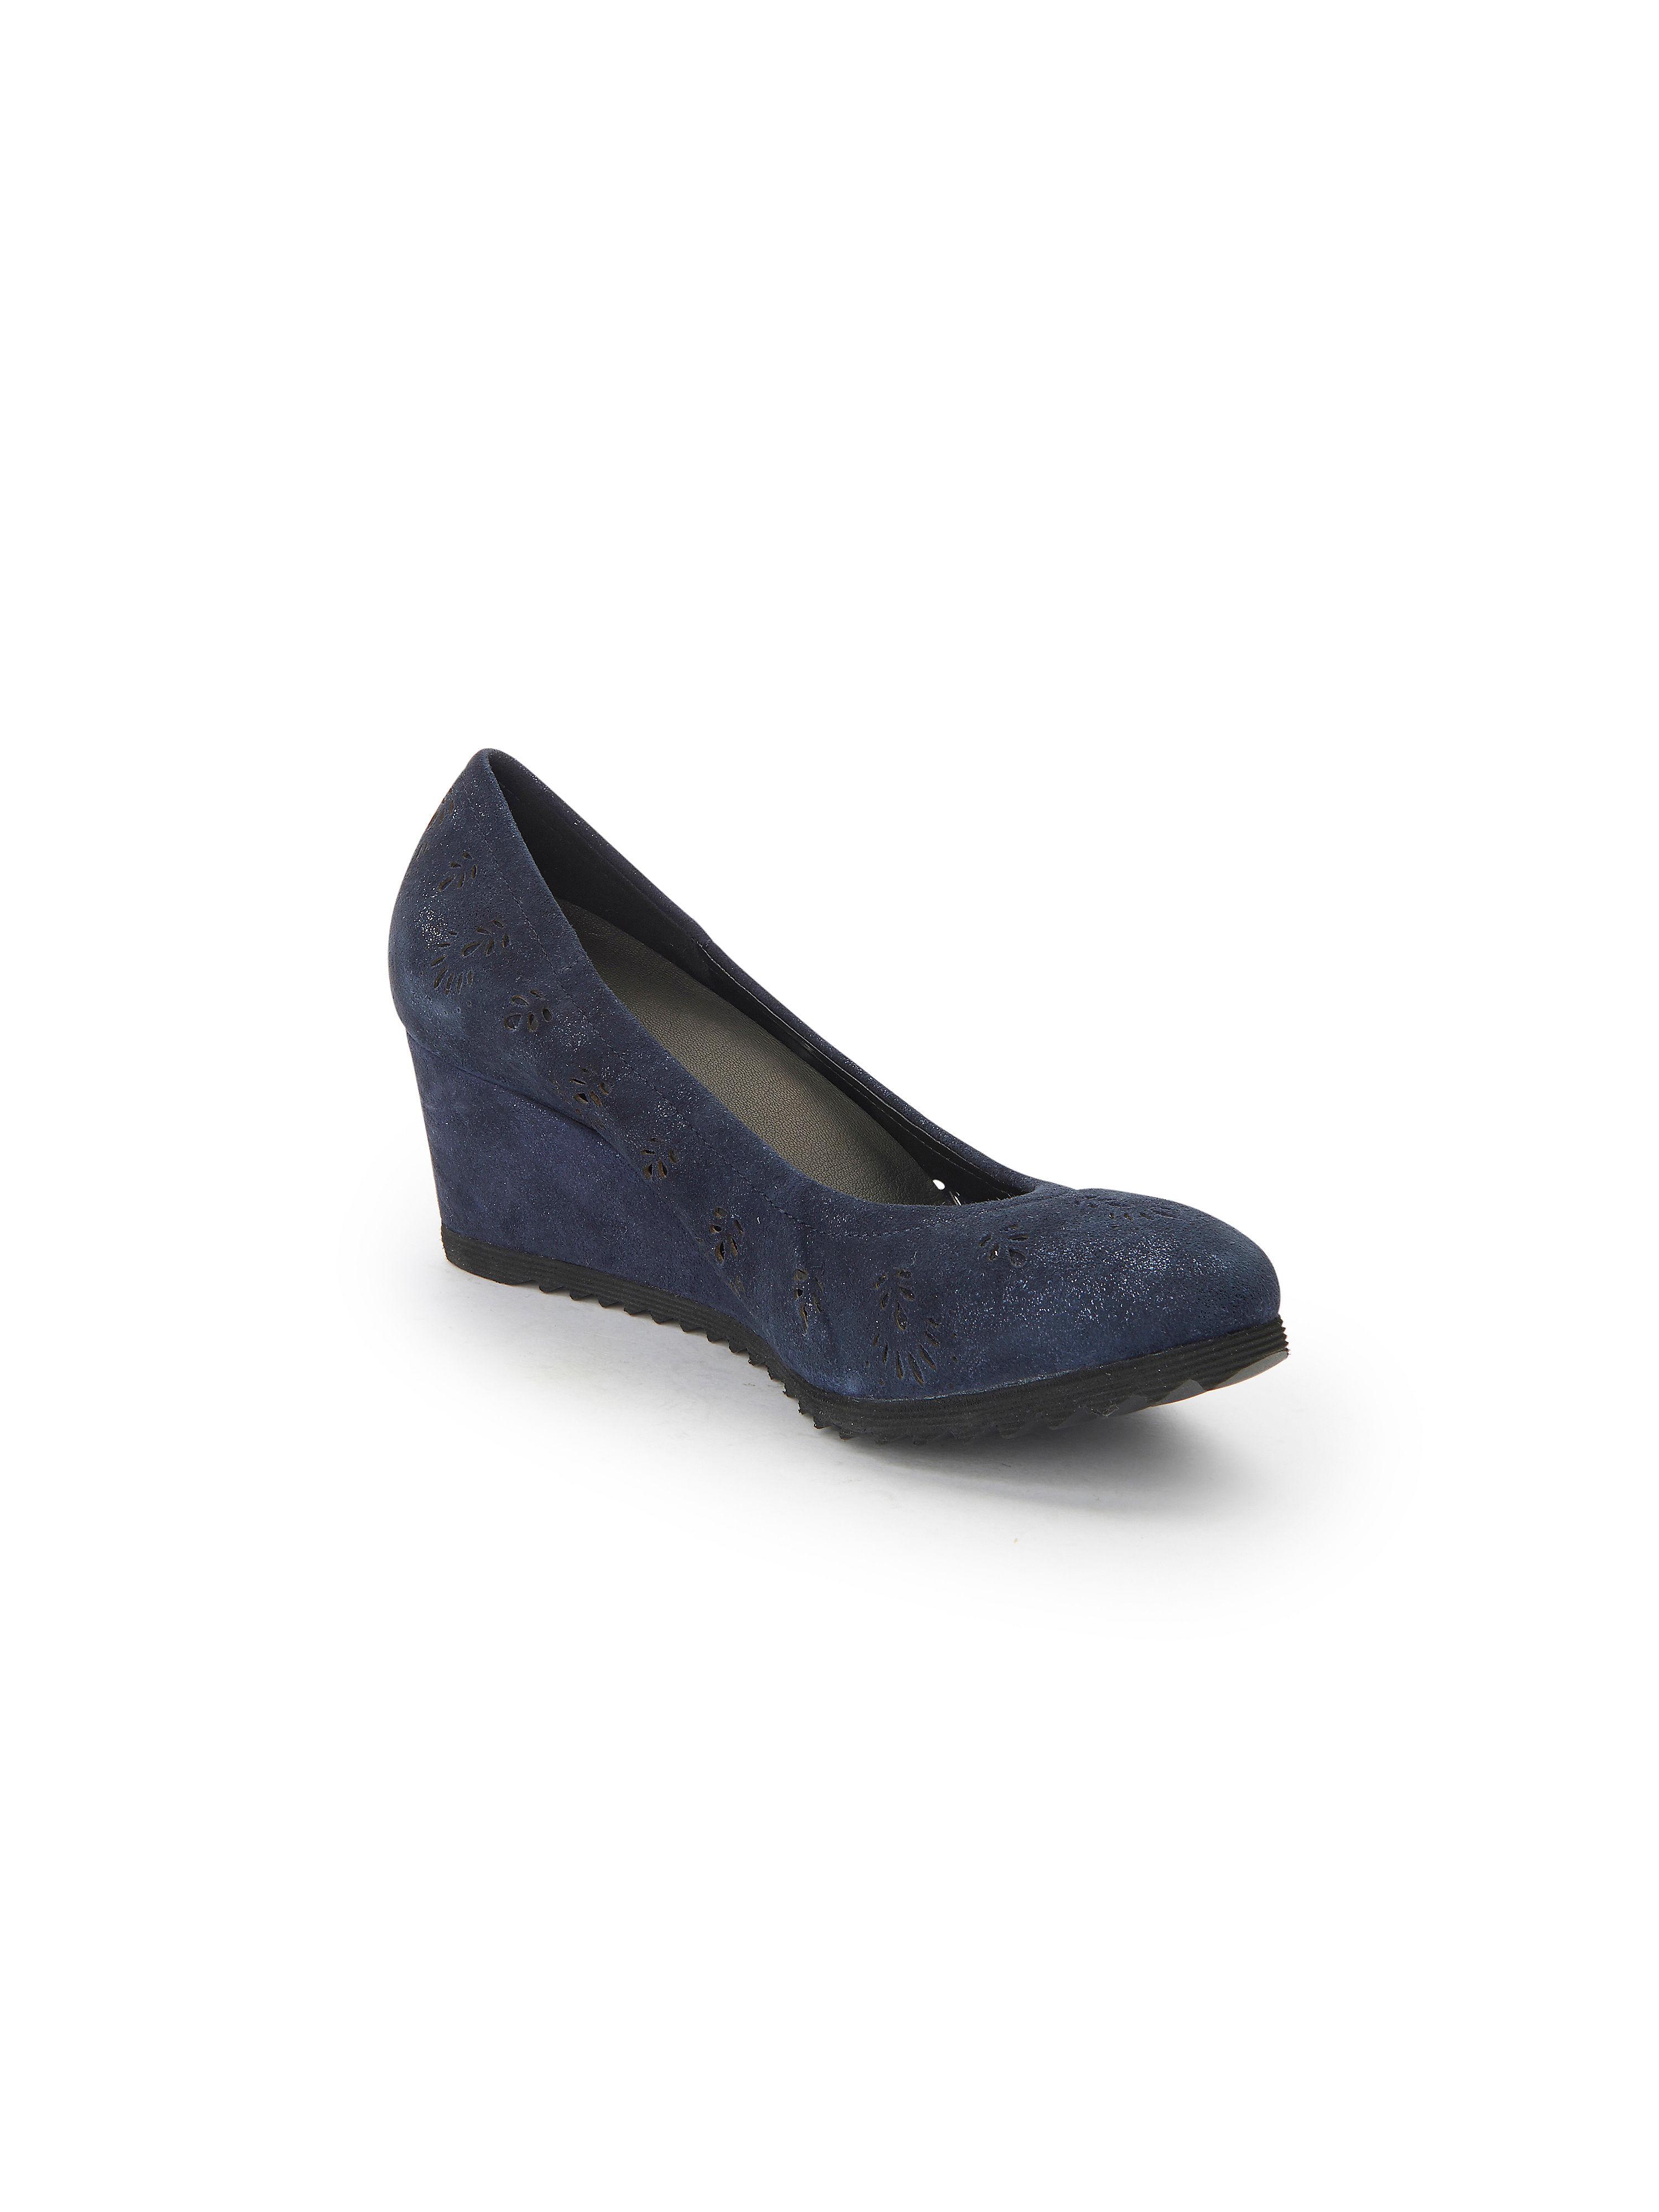 Gerry Weber - Pumps aus 100% Leder - Marine Gute Qualität beliebte Schuhe